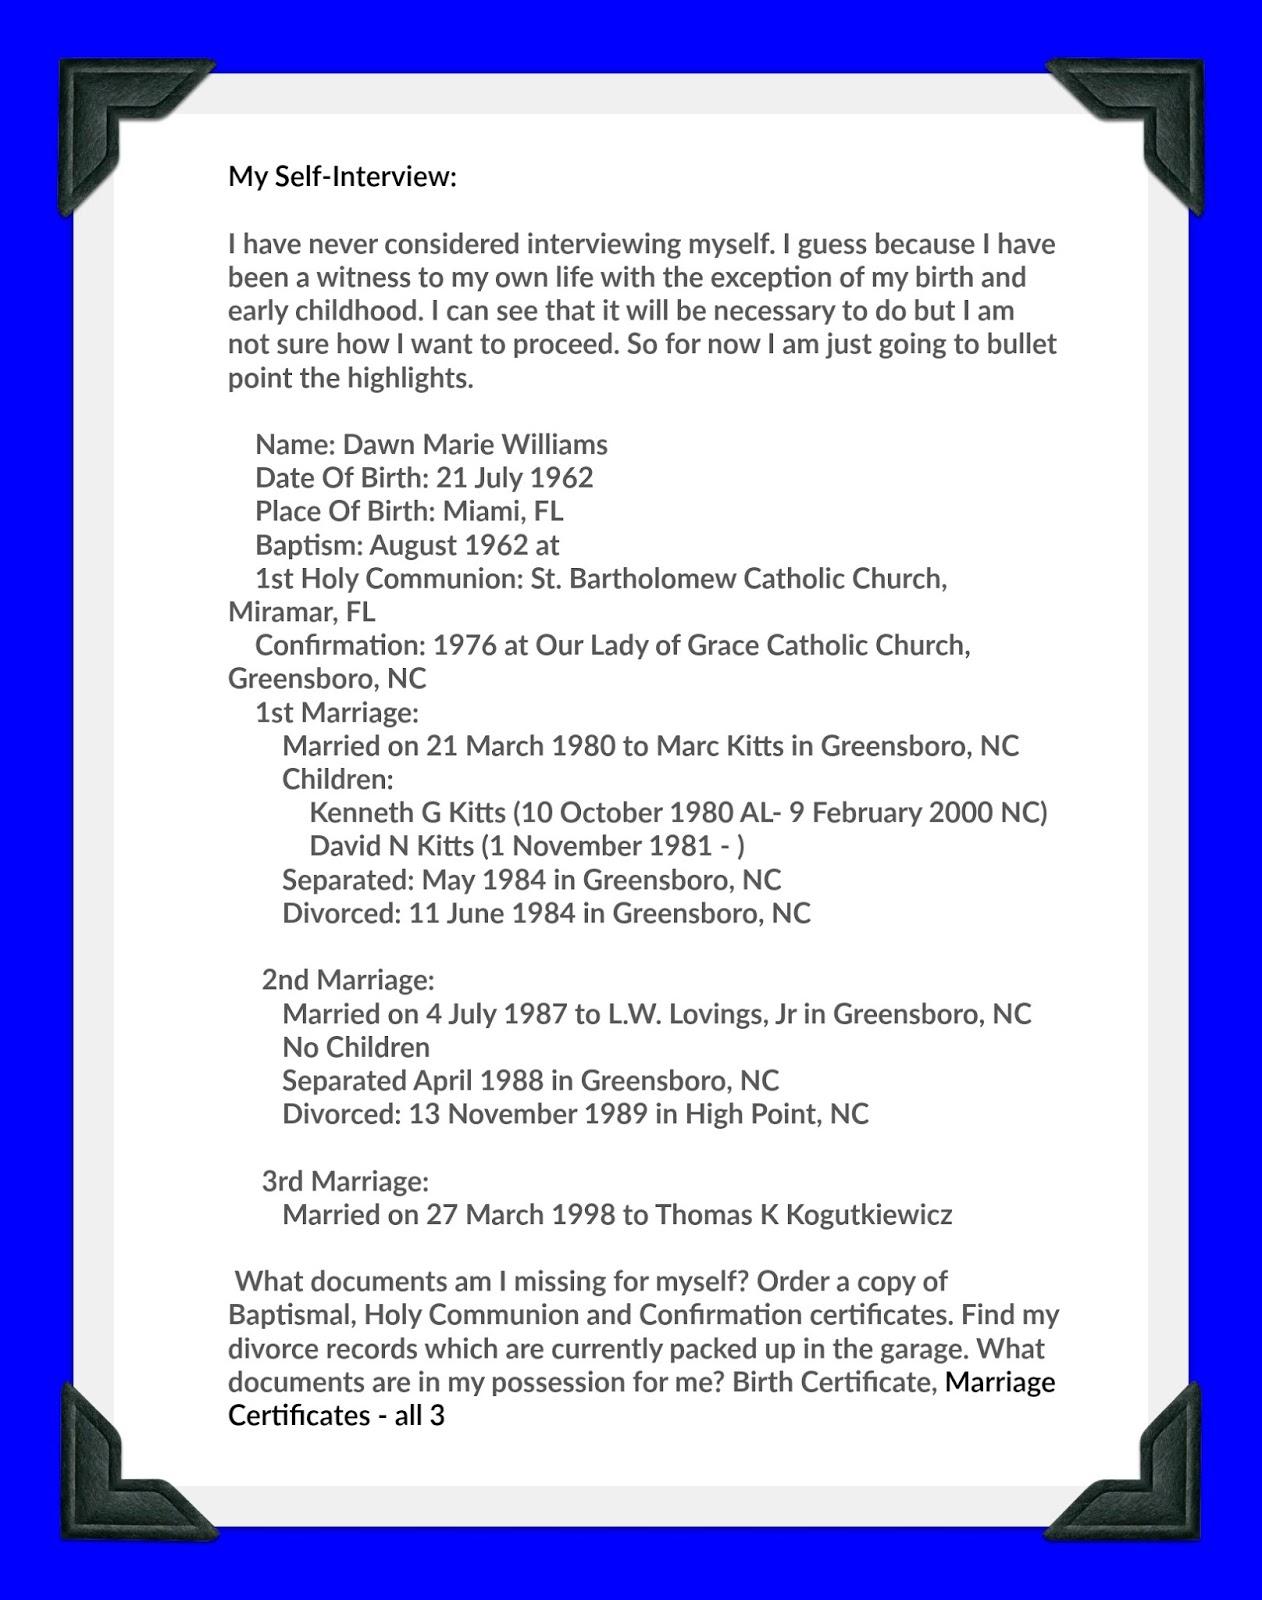 Free Professional Resume Birth Certificate Greensboro Nc